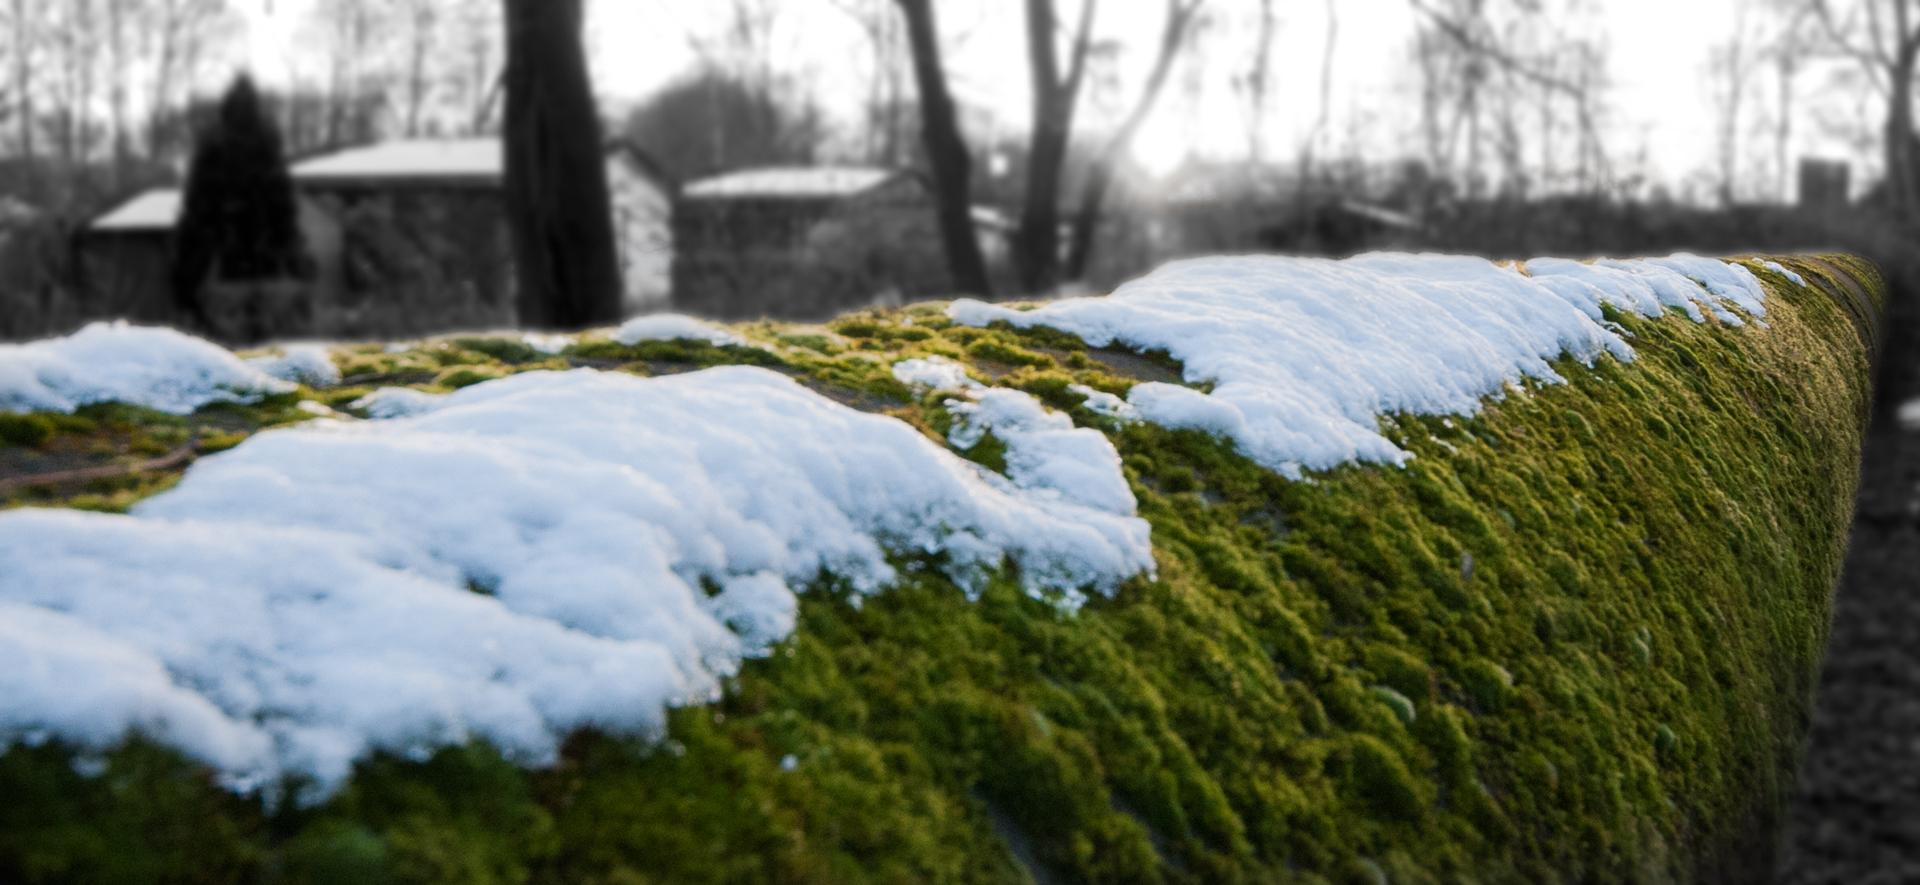 Pipeline 3 (Winter)